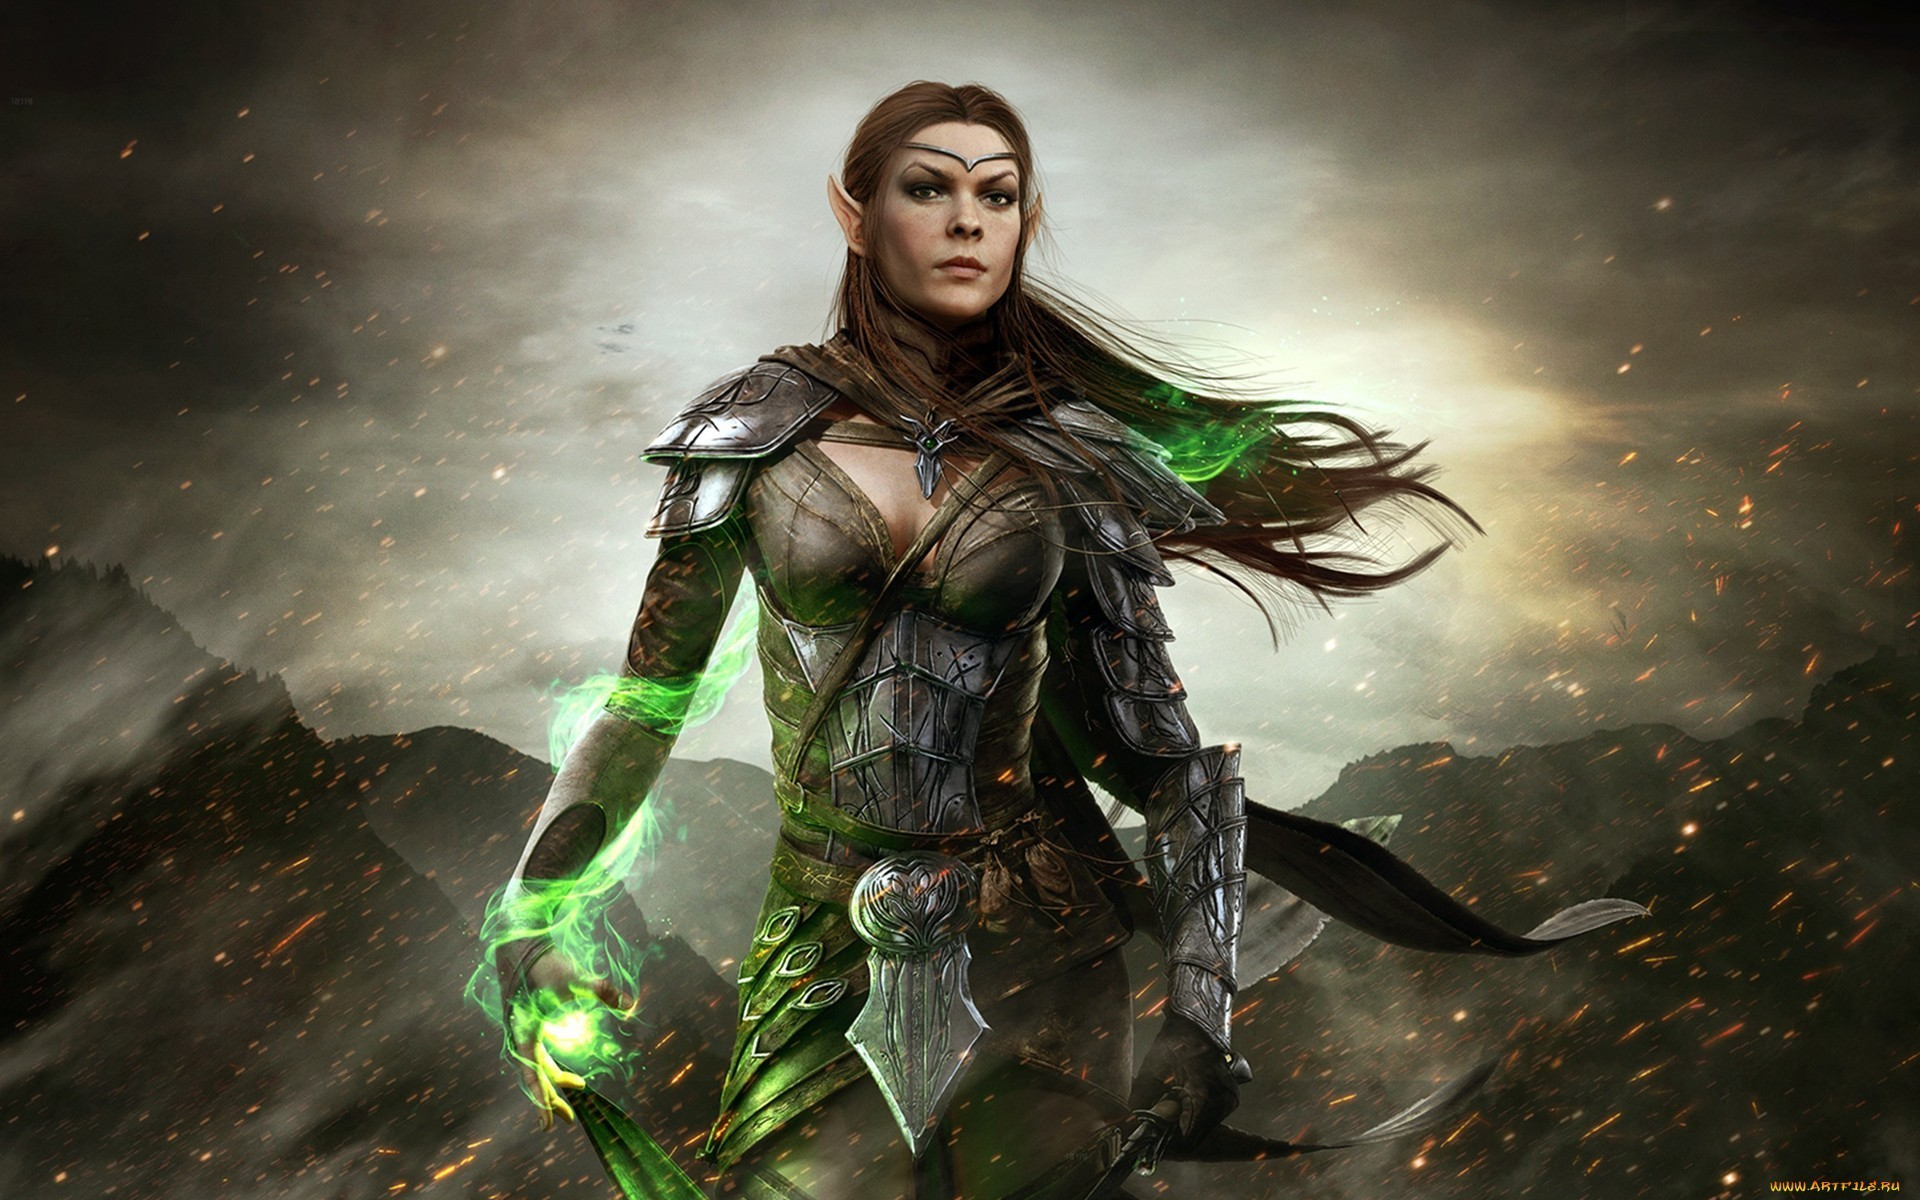 Video Game – The Elder Scrolls Online Wallpaper